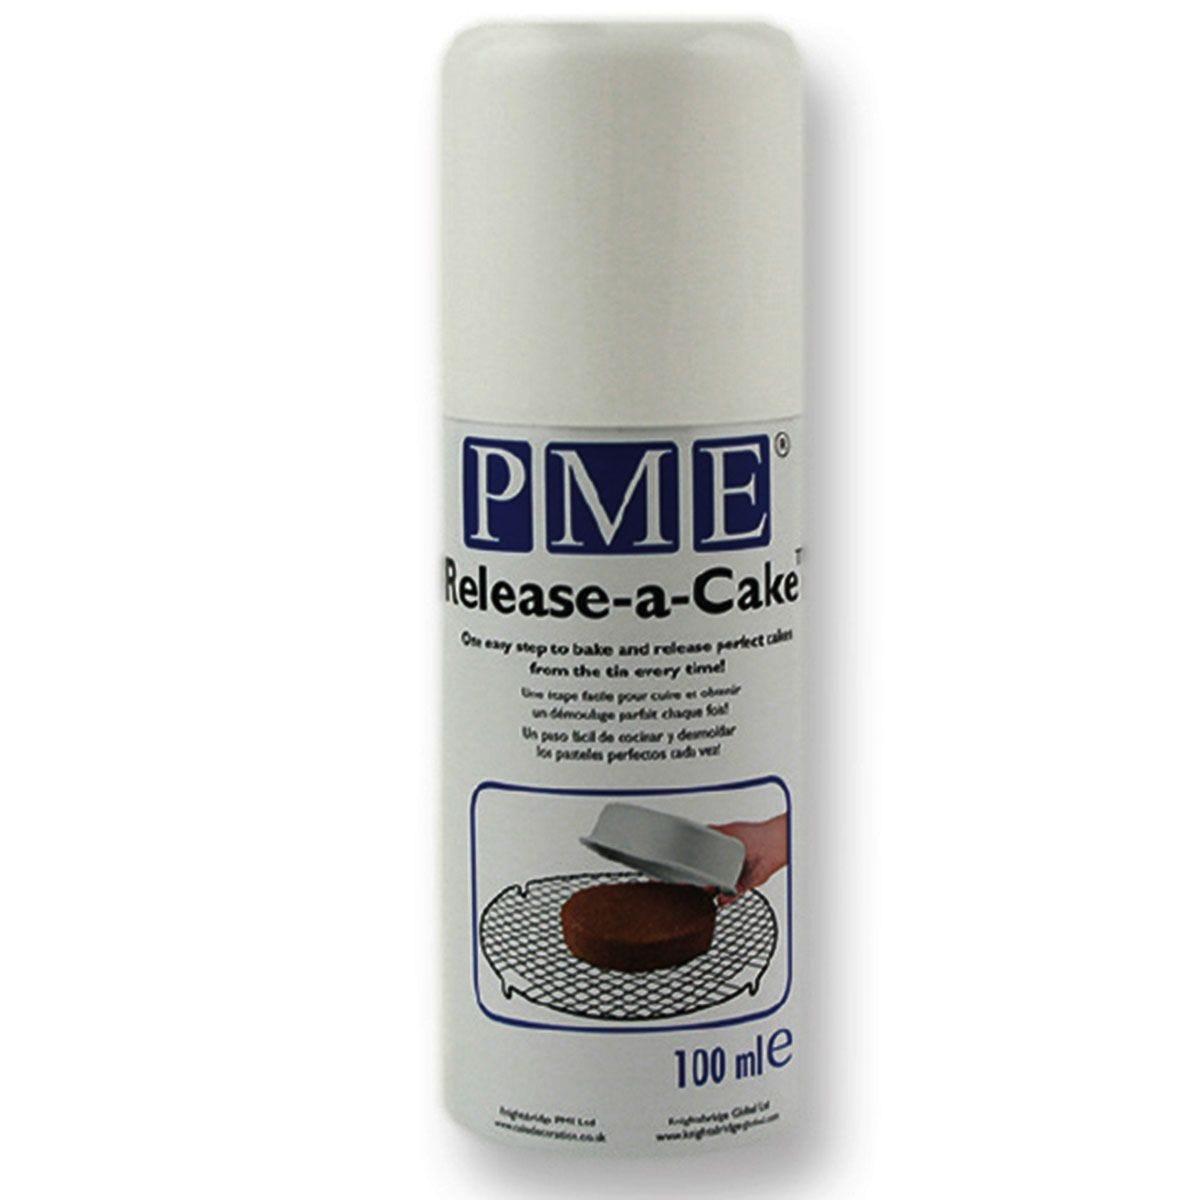 PME Release-a-Cake Spray - 100ml